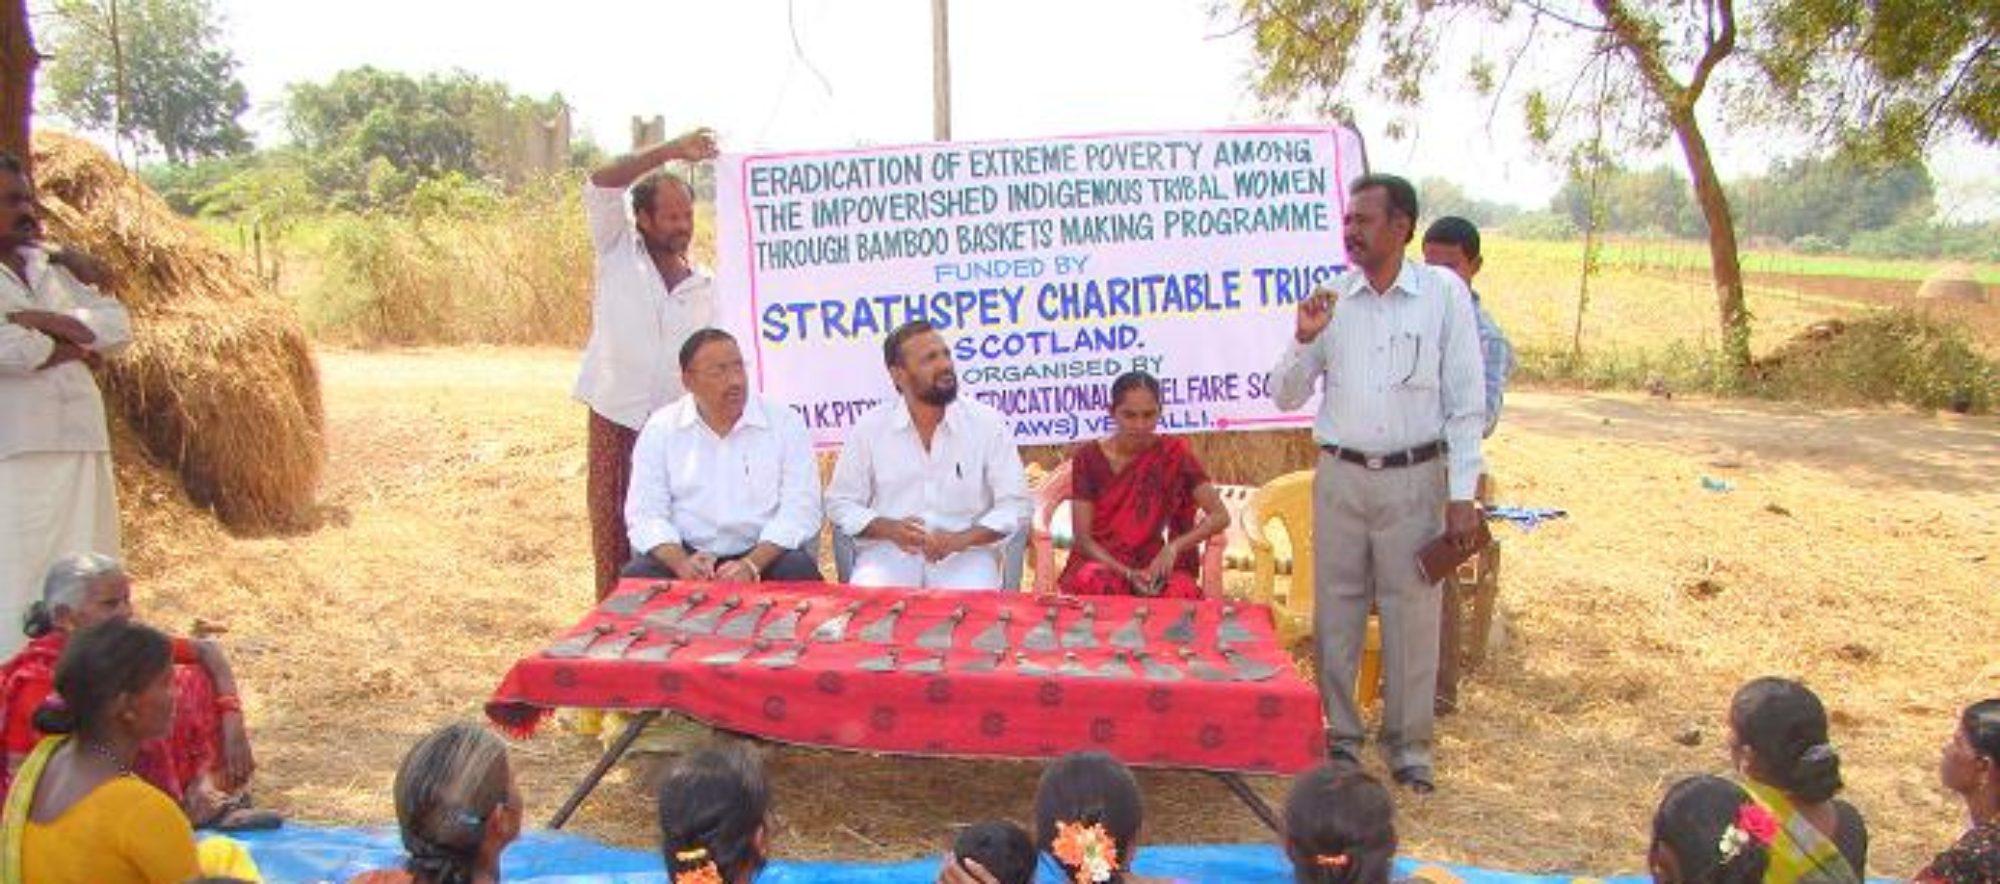 Strathspey Charitable Trust